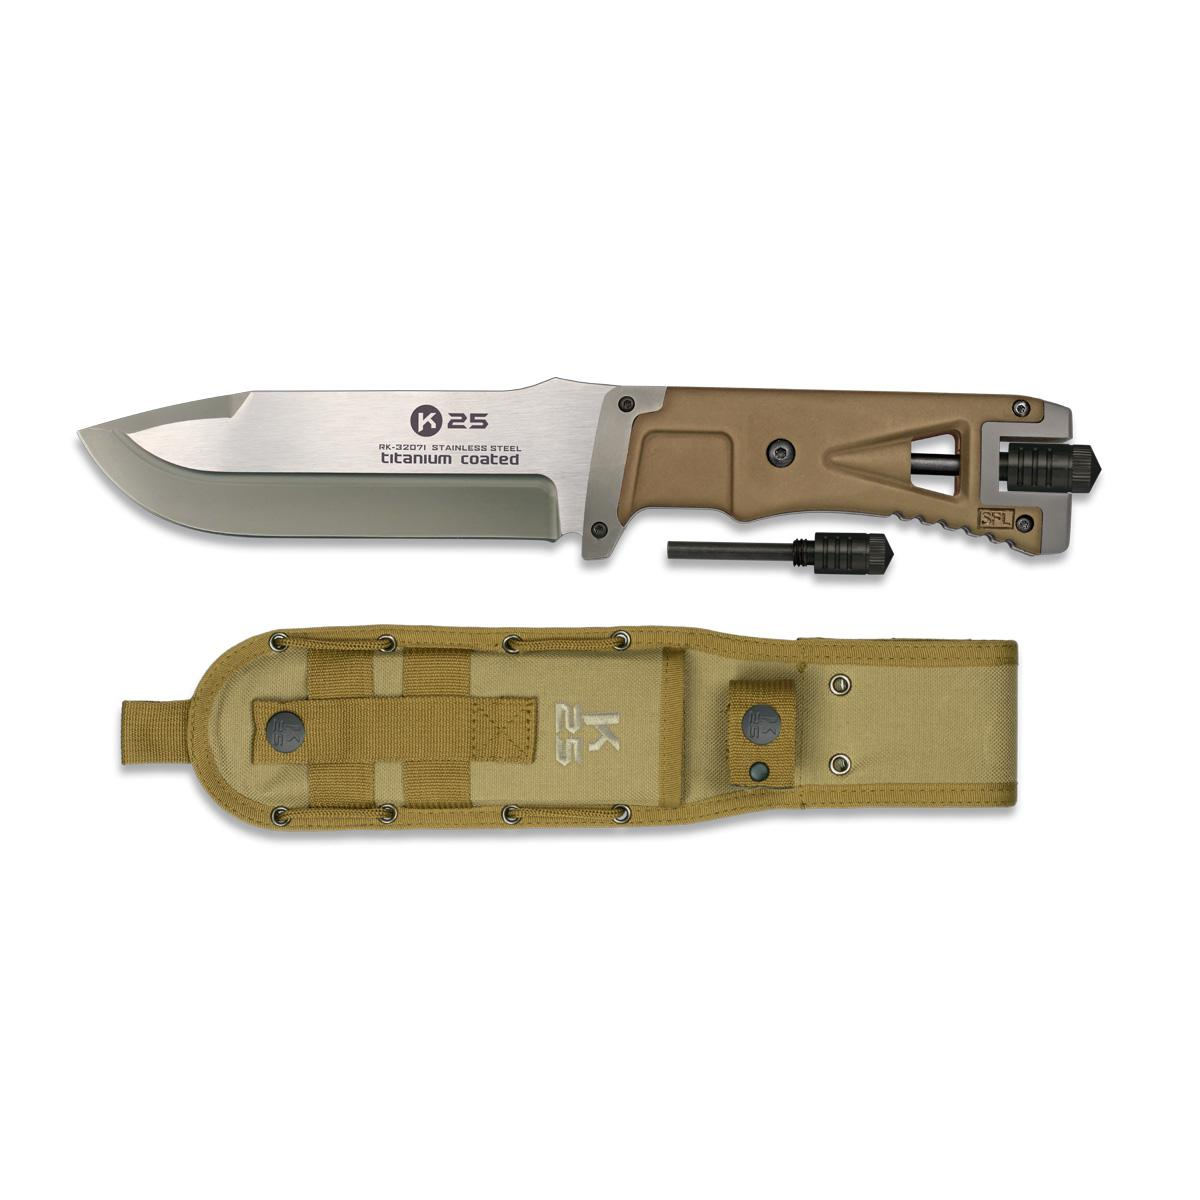 Cuchillo Tactico con Pedernal K25 Coyote